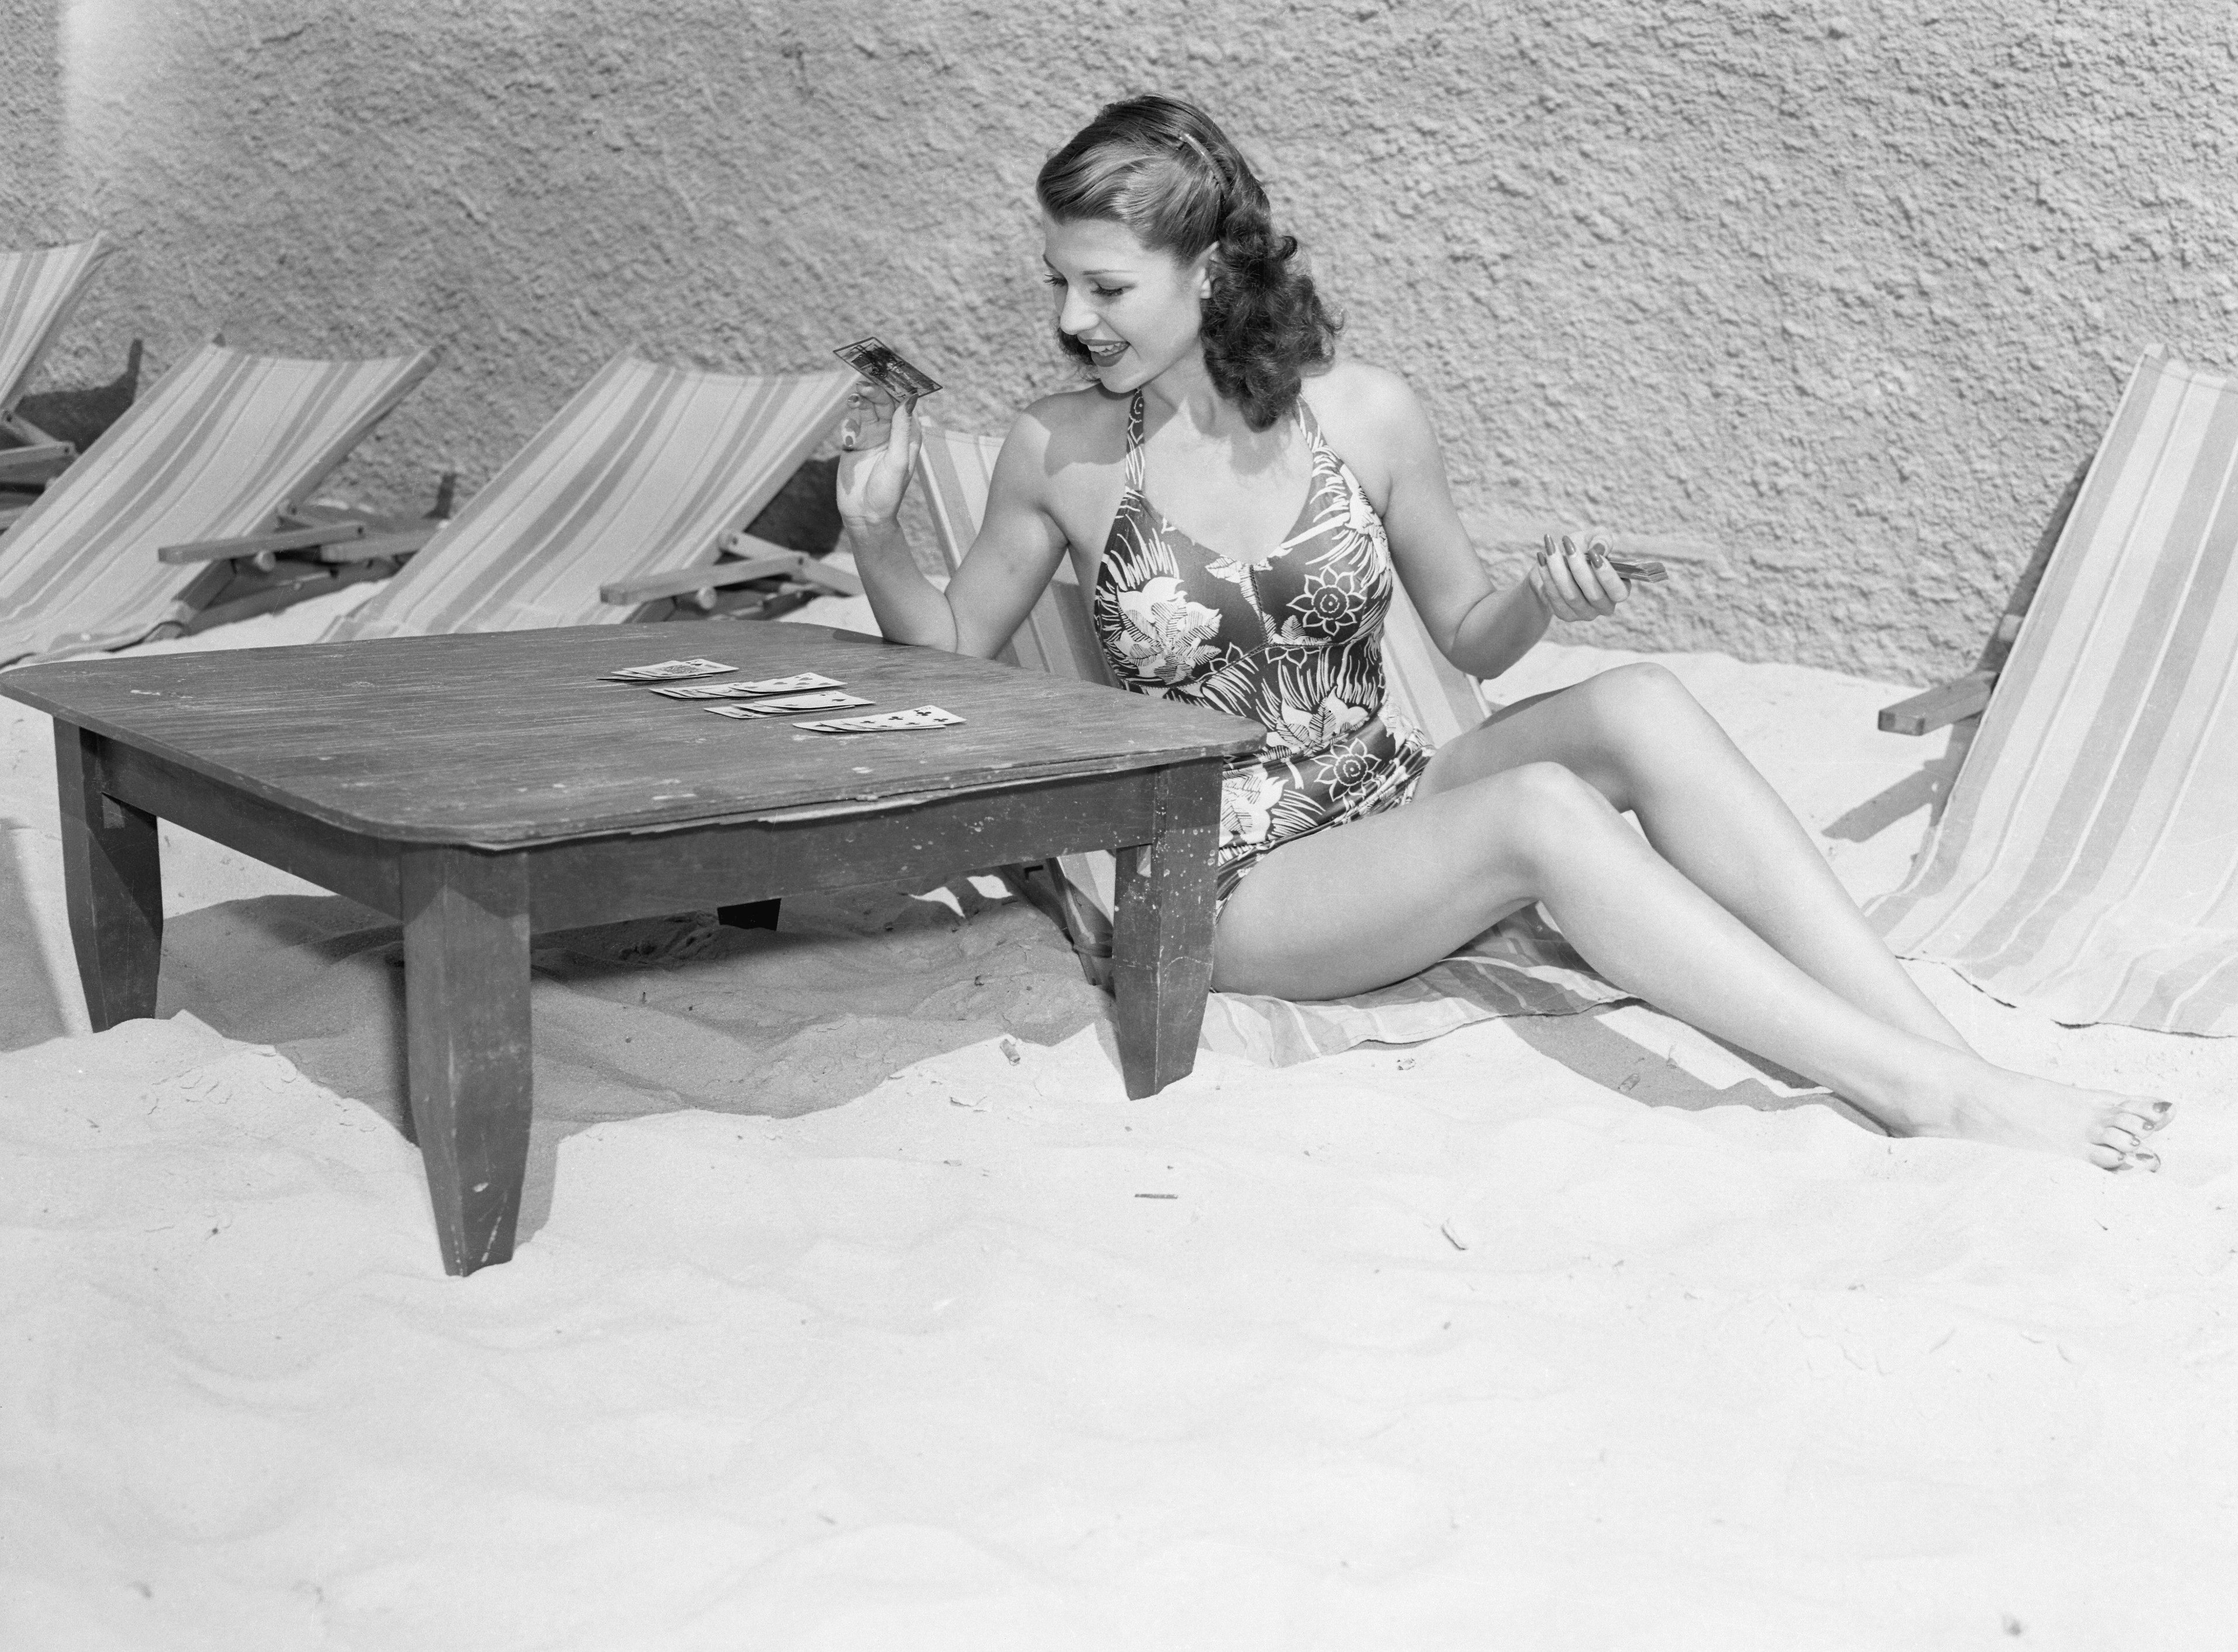 Rita Hayworth Playing Cards at a Beach